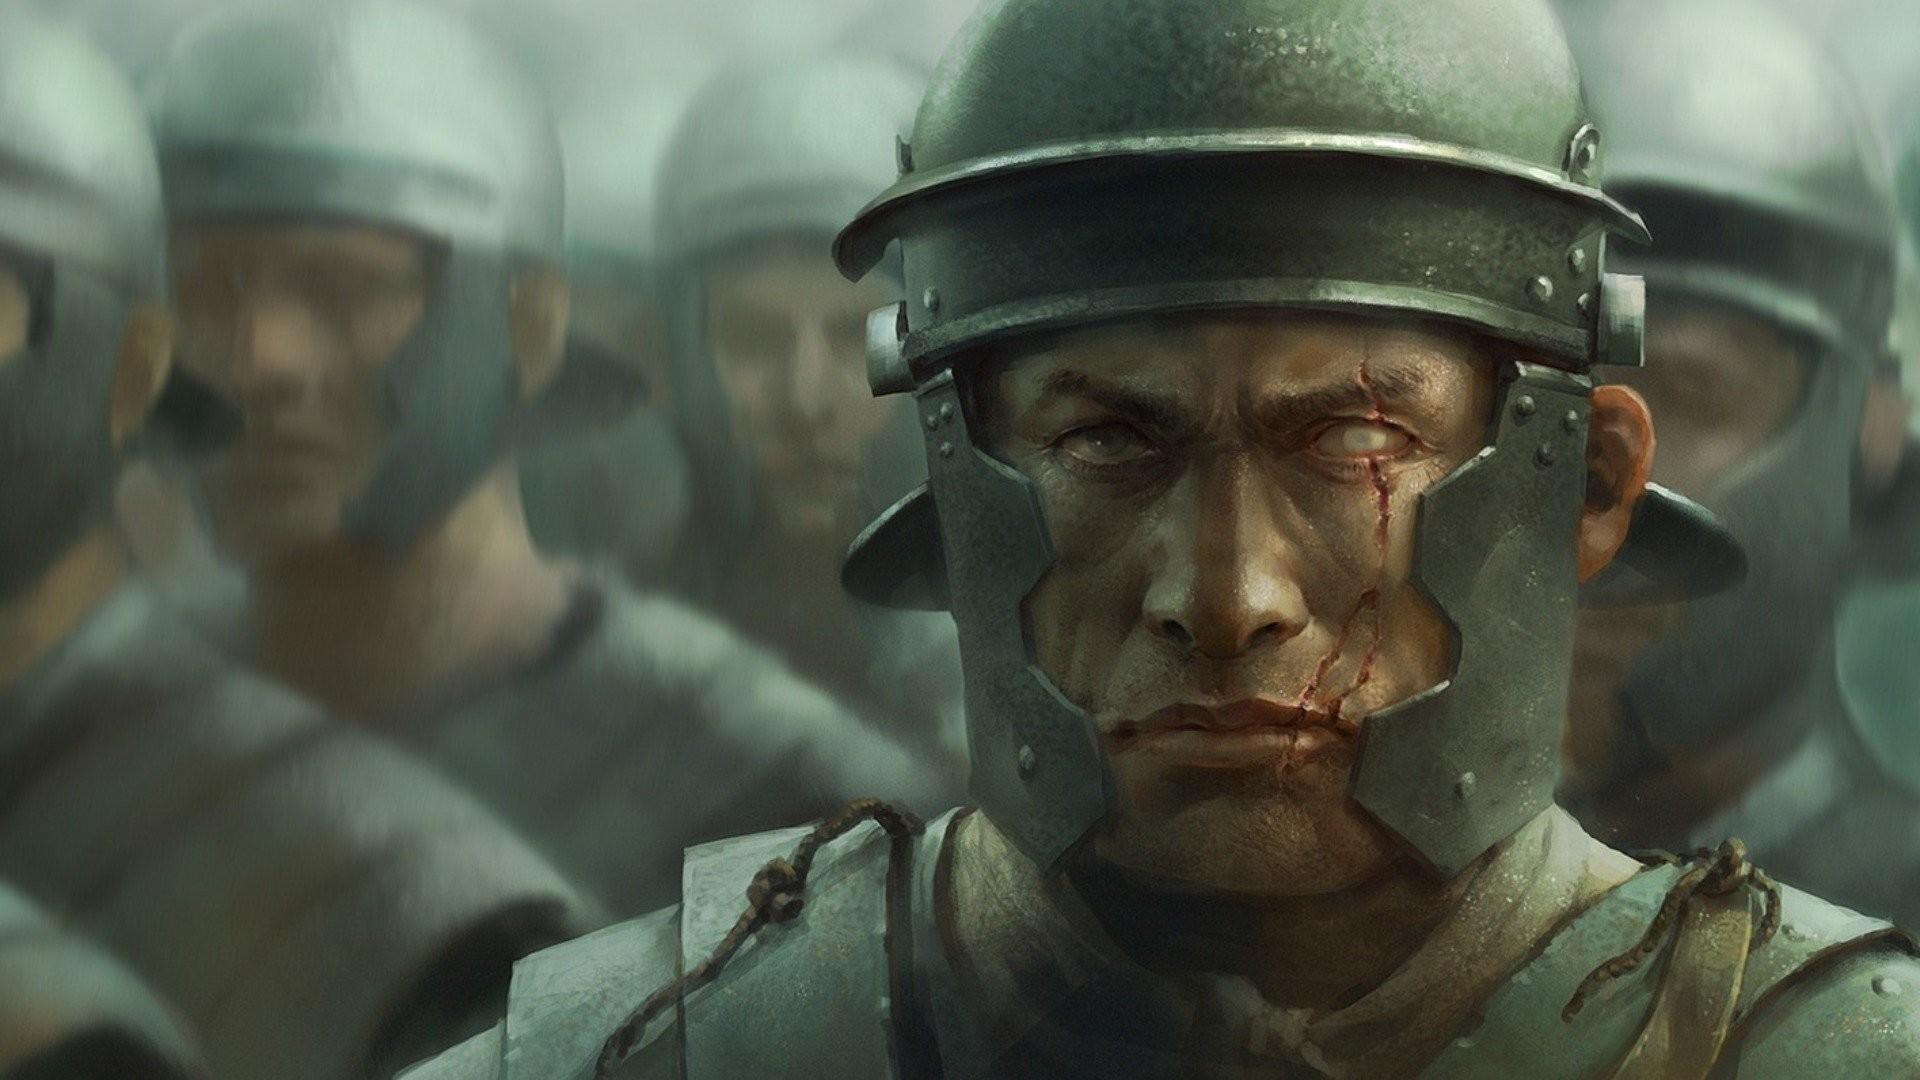 men warrior romans armour helmet face scar